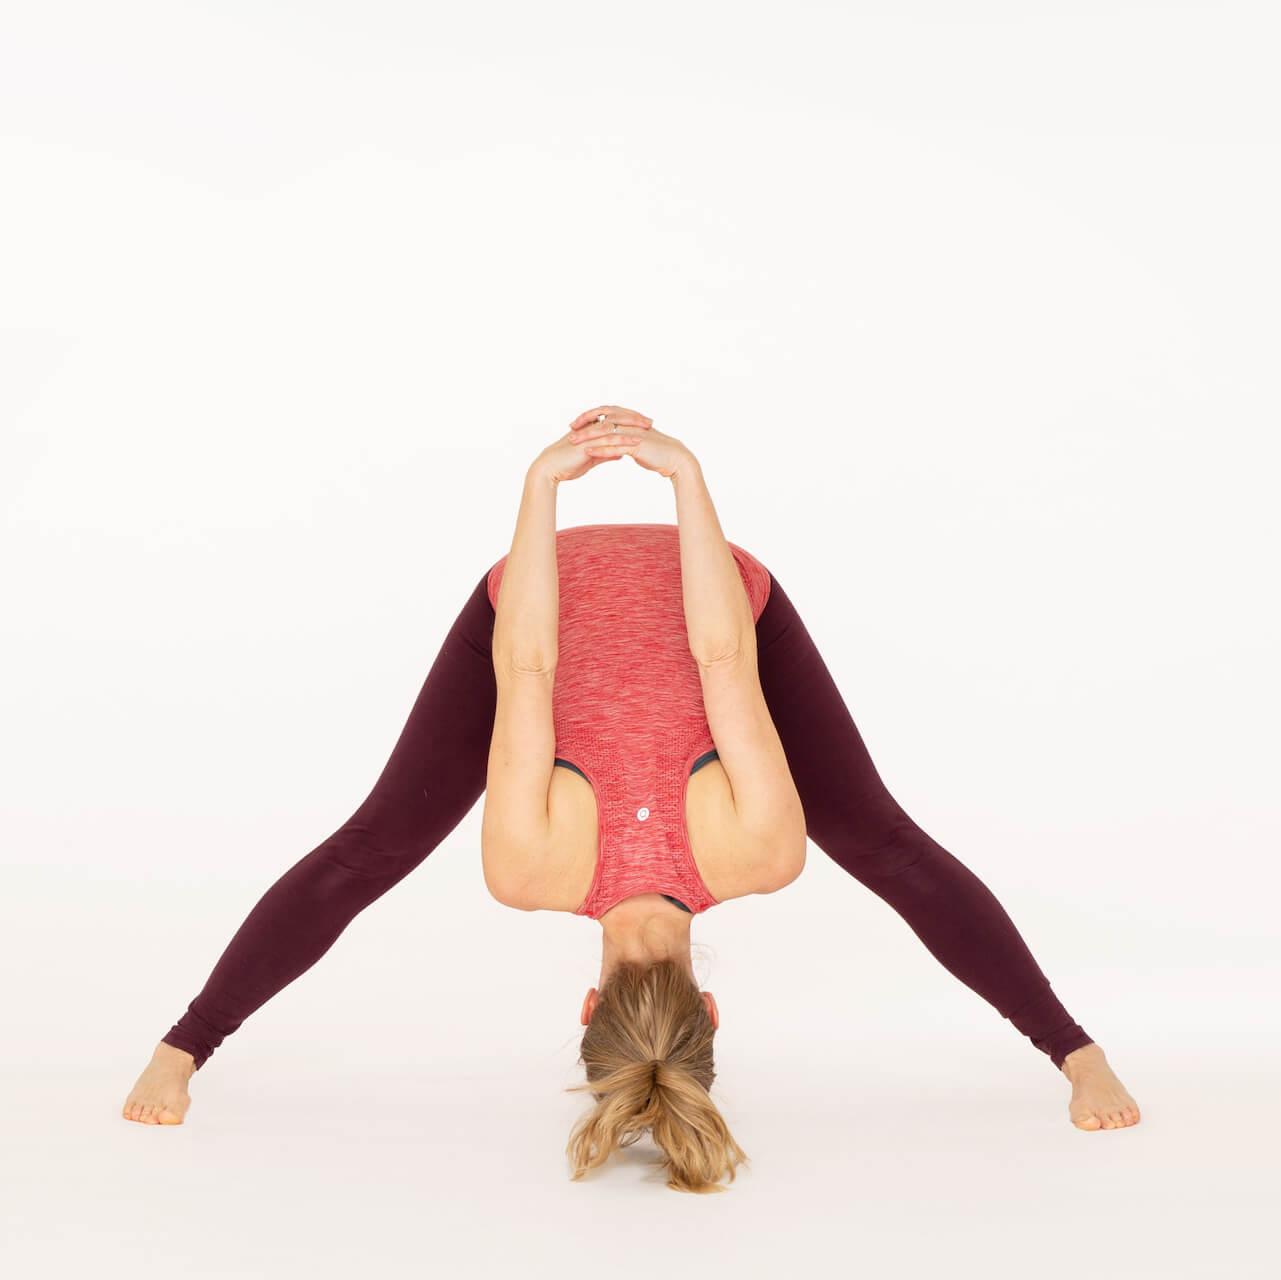 How To Do Wide Legged Forward Bend C-Prasarita